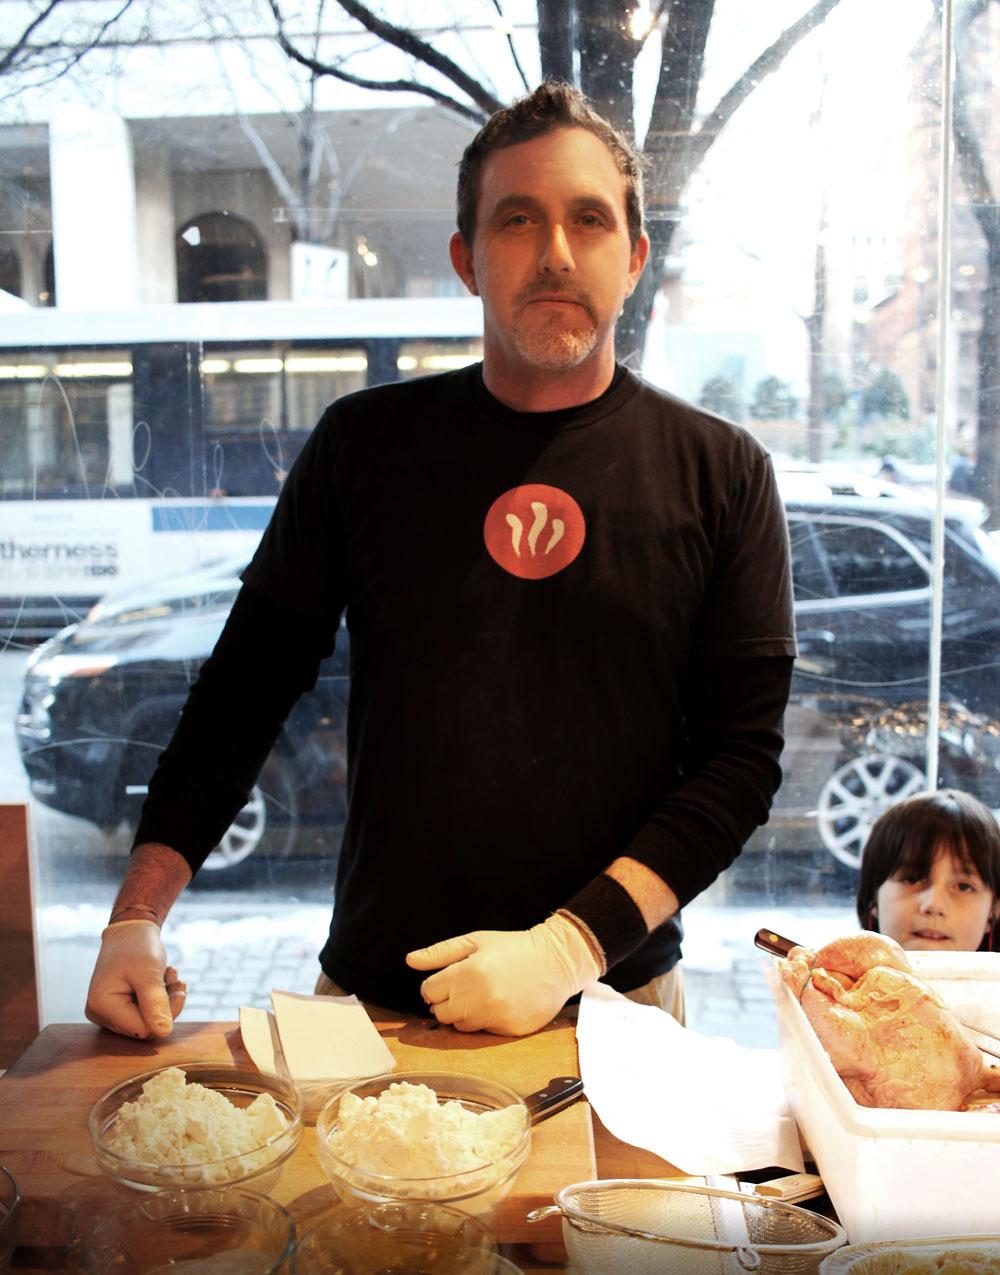 Ben Grossman - Co-owner of Smoke Joint, Peaches, HotHouse & Marietta